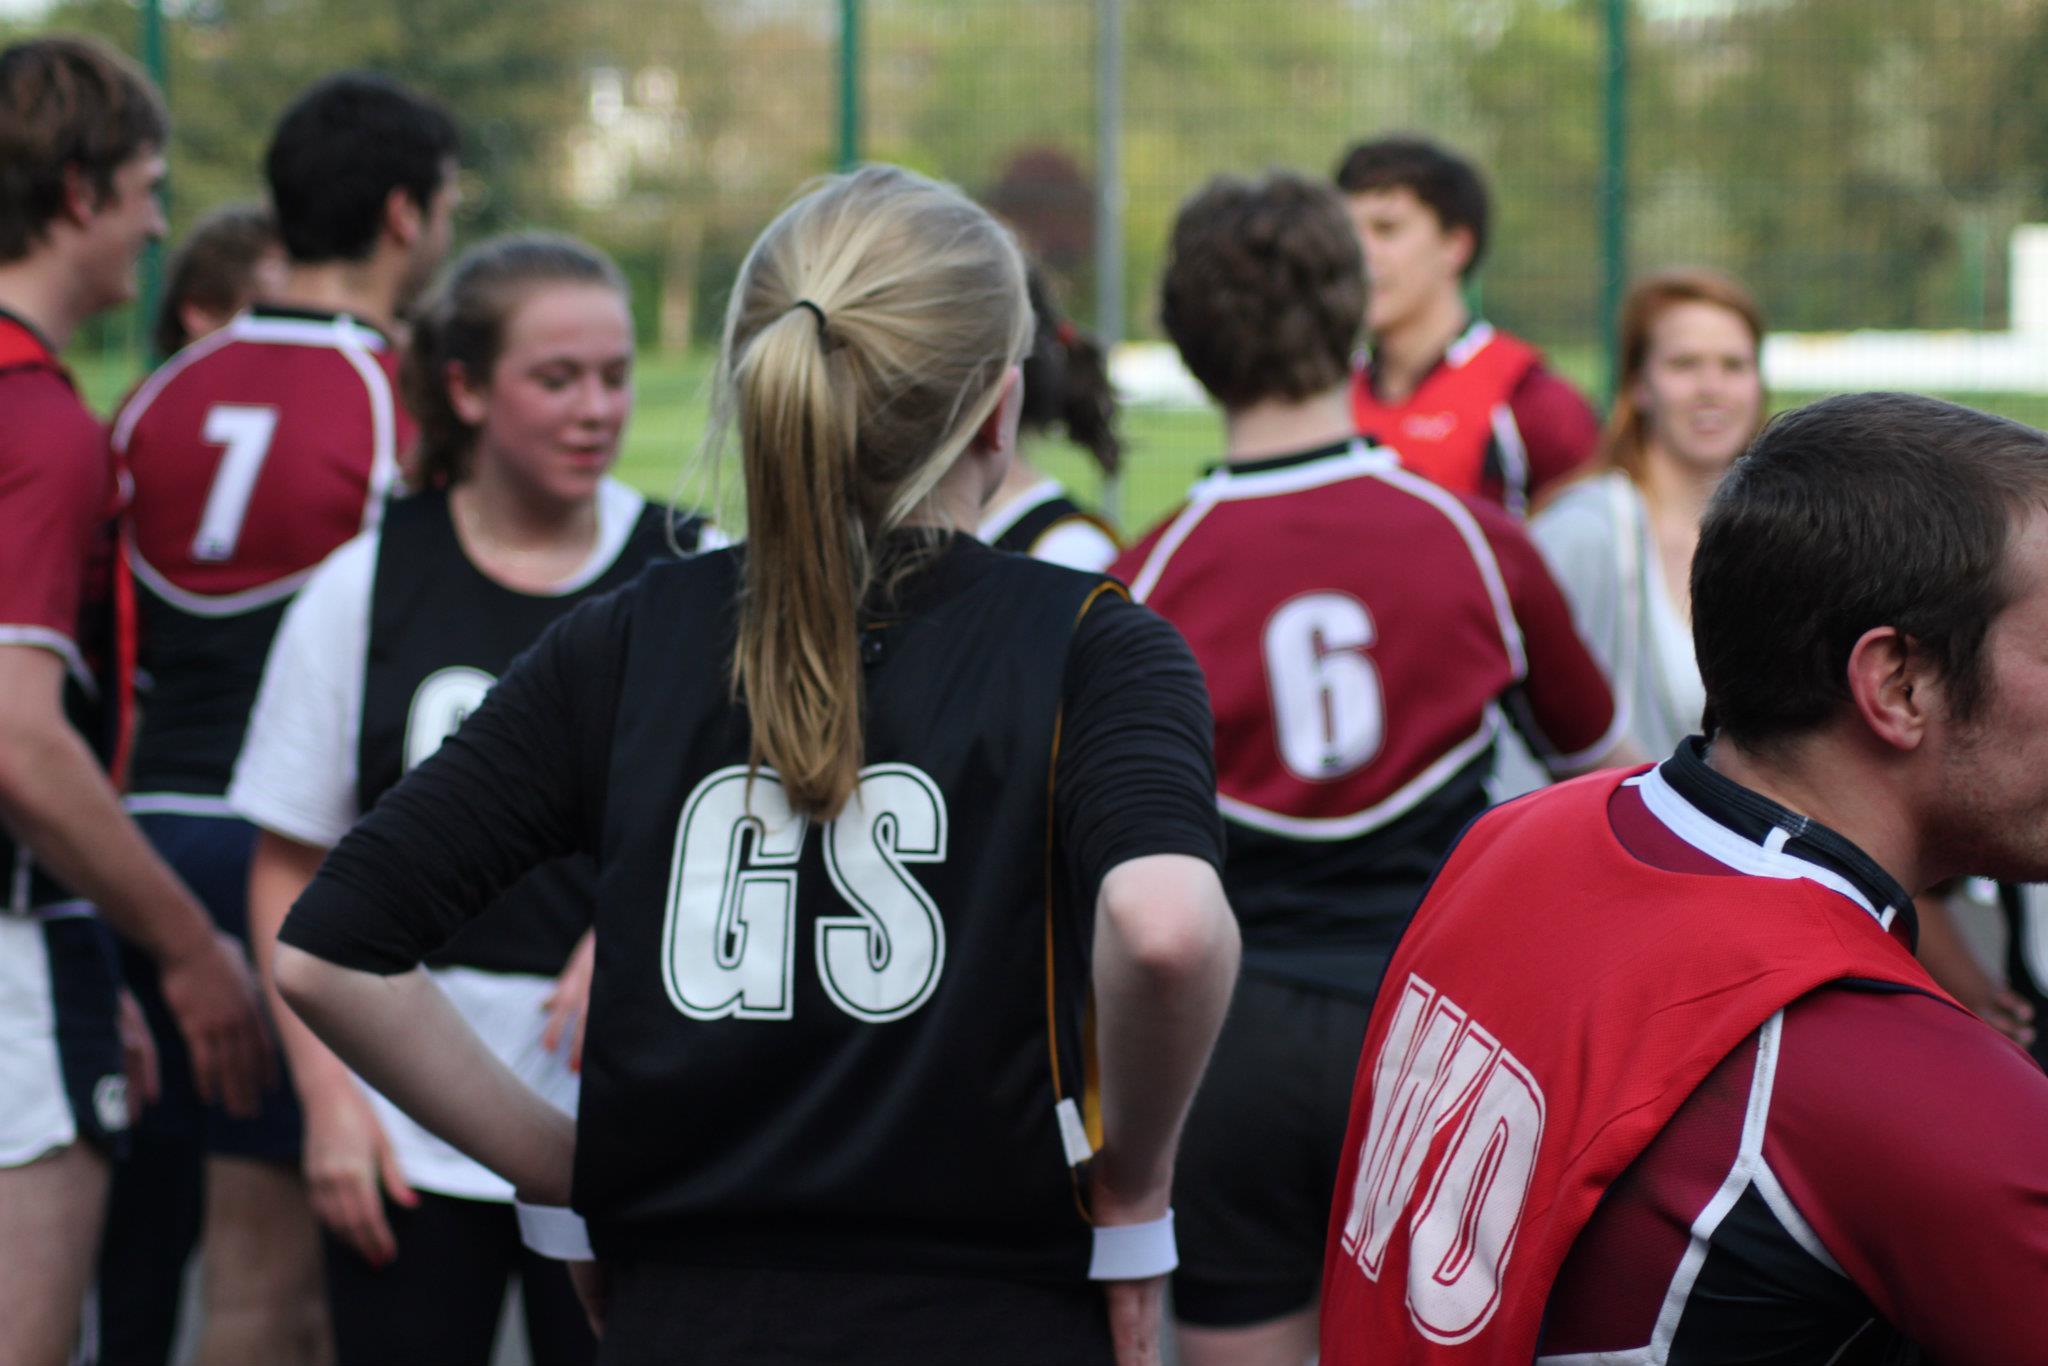 ECNC Exeter's Netball Club